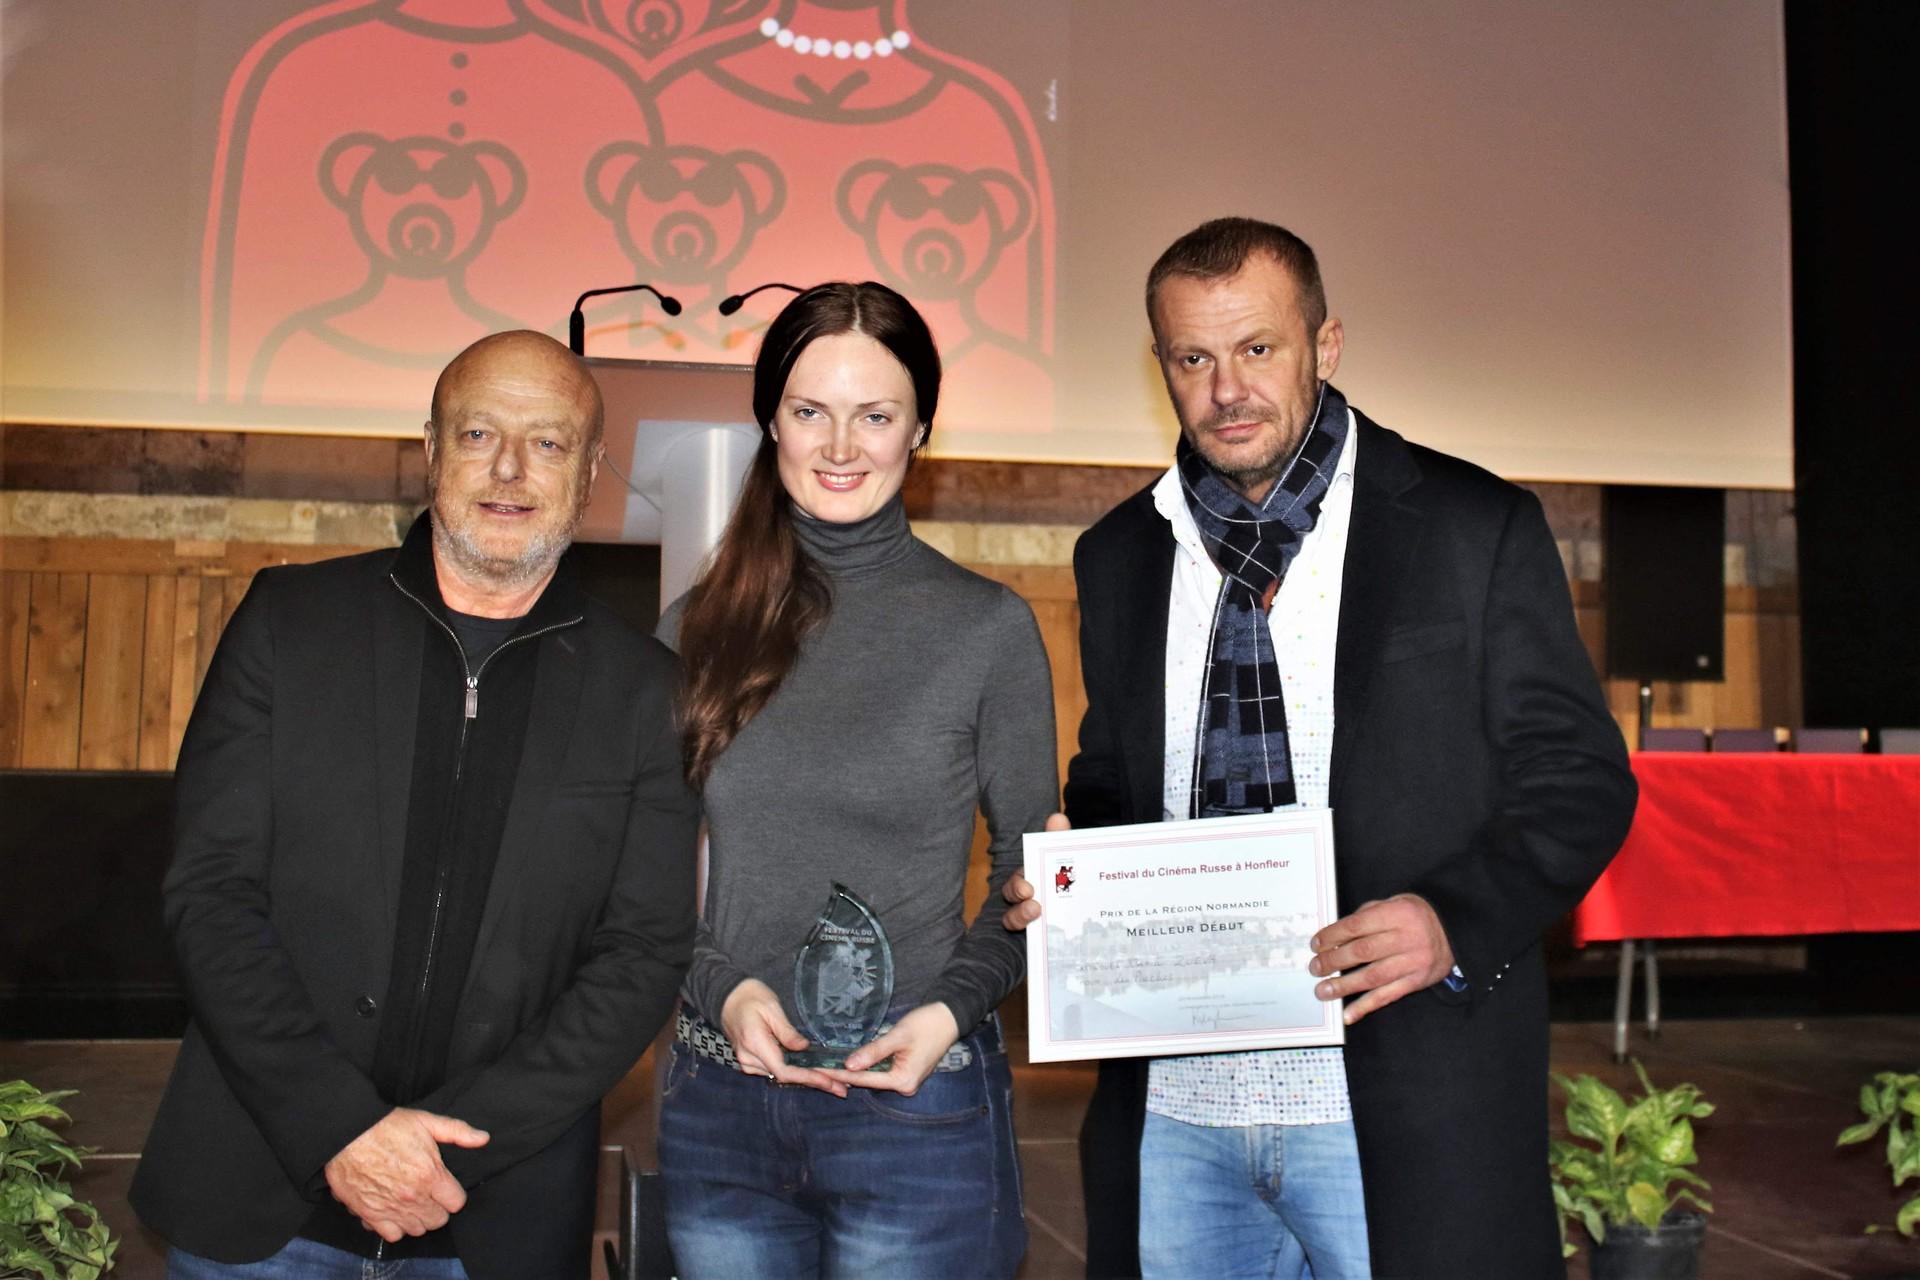 Gérard Krawczyk, Président du Jury, la productrice Katerina Mikhailova et Andrey Stoyanov, acteur du film Les proches